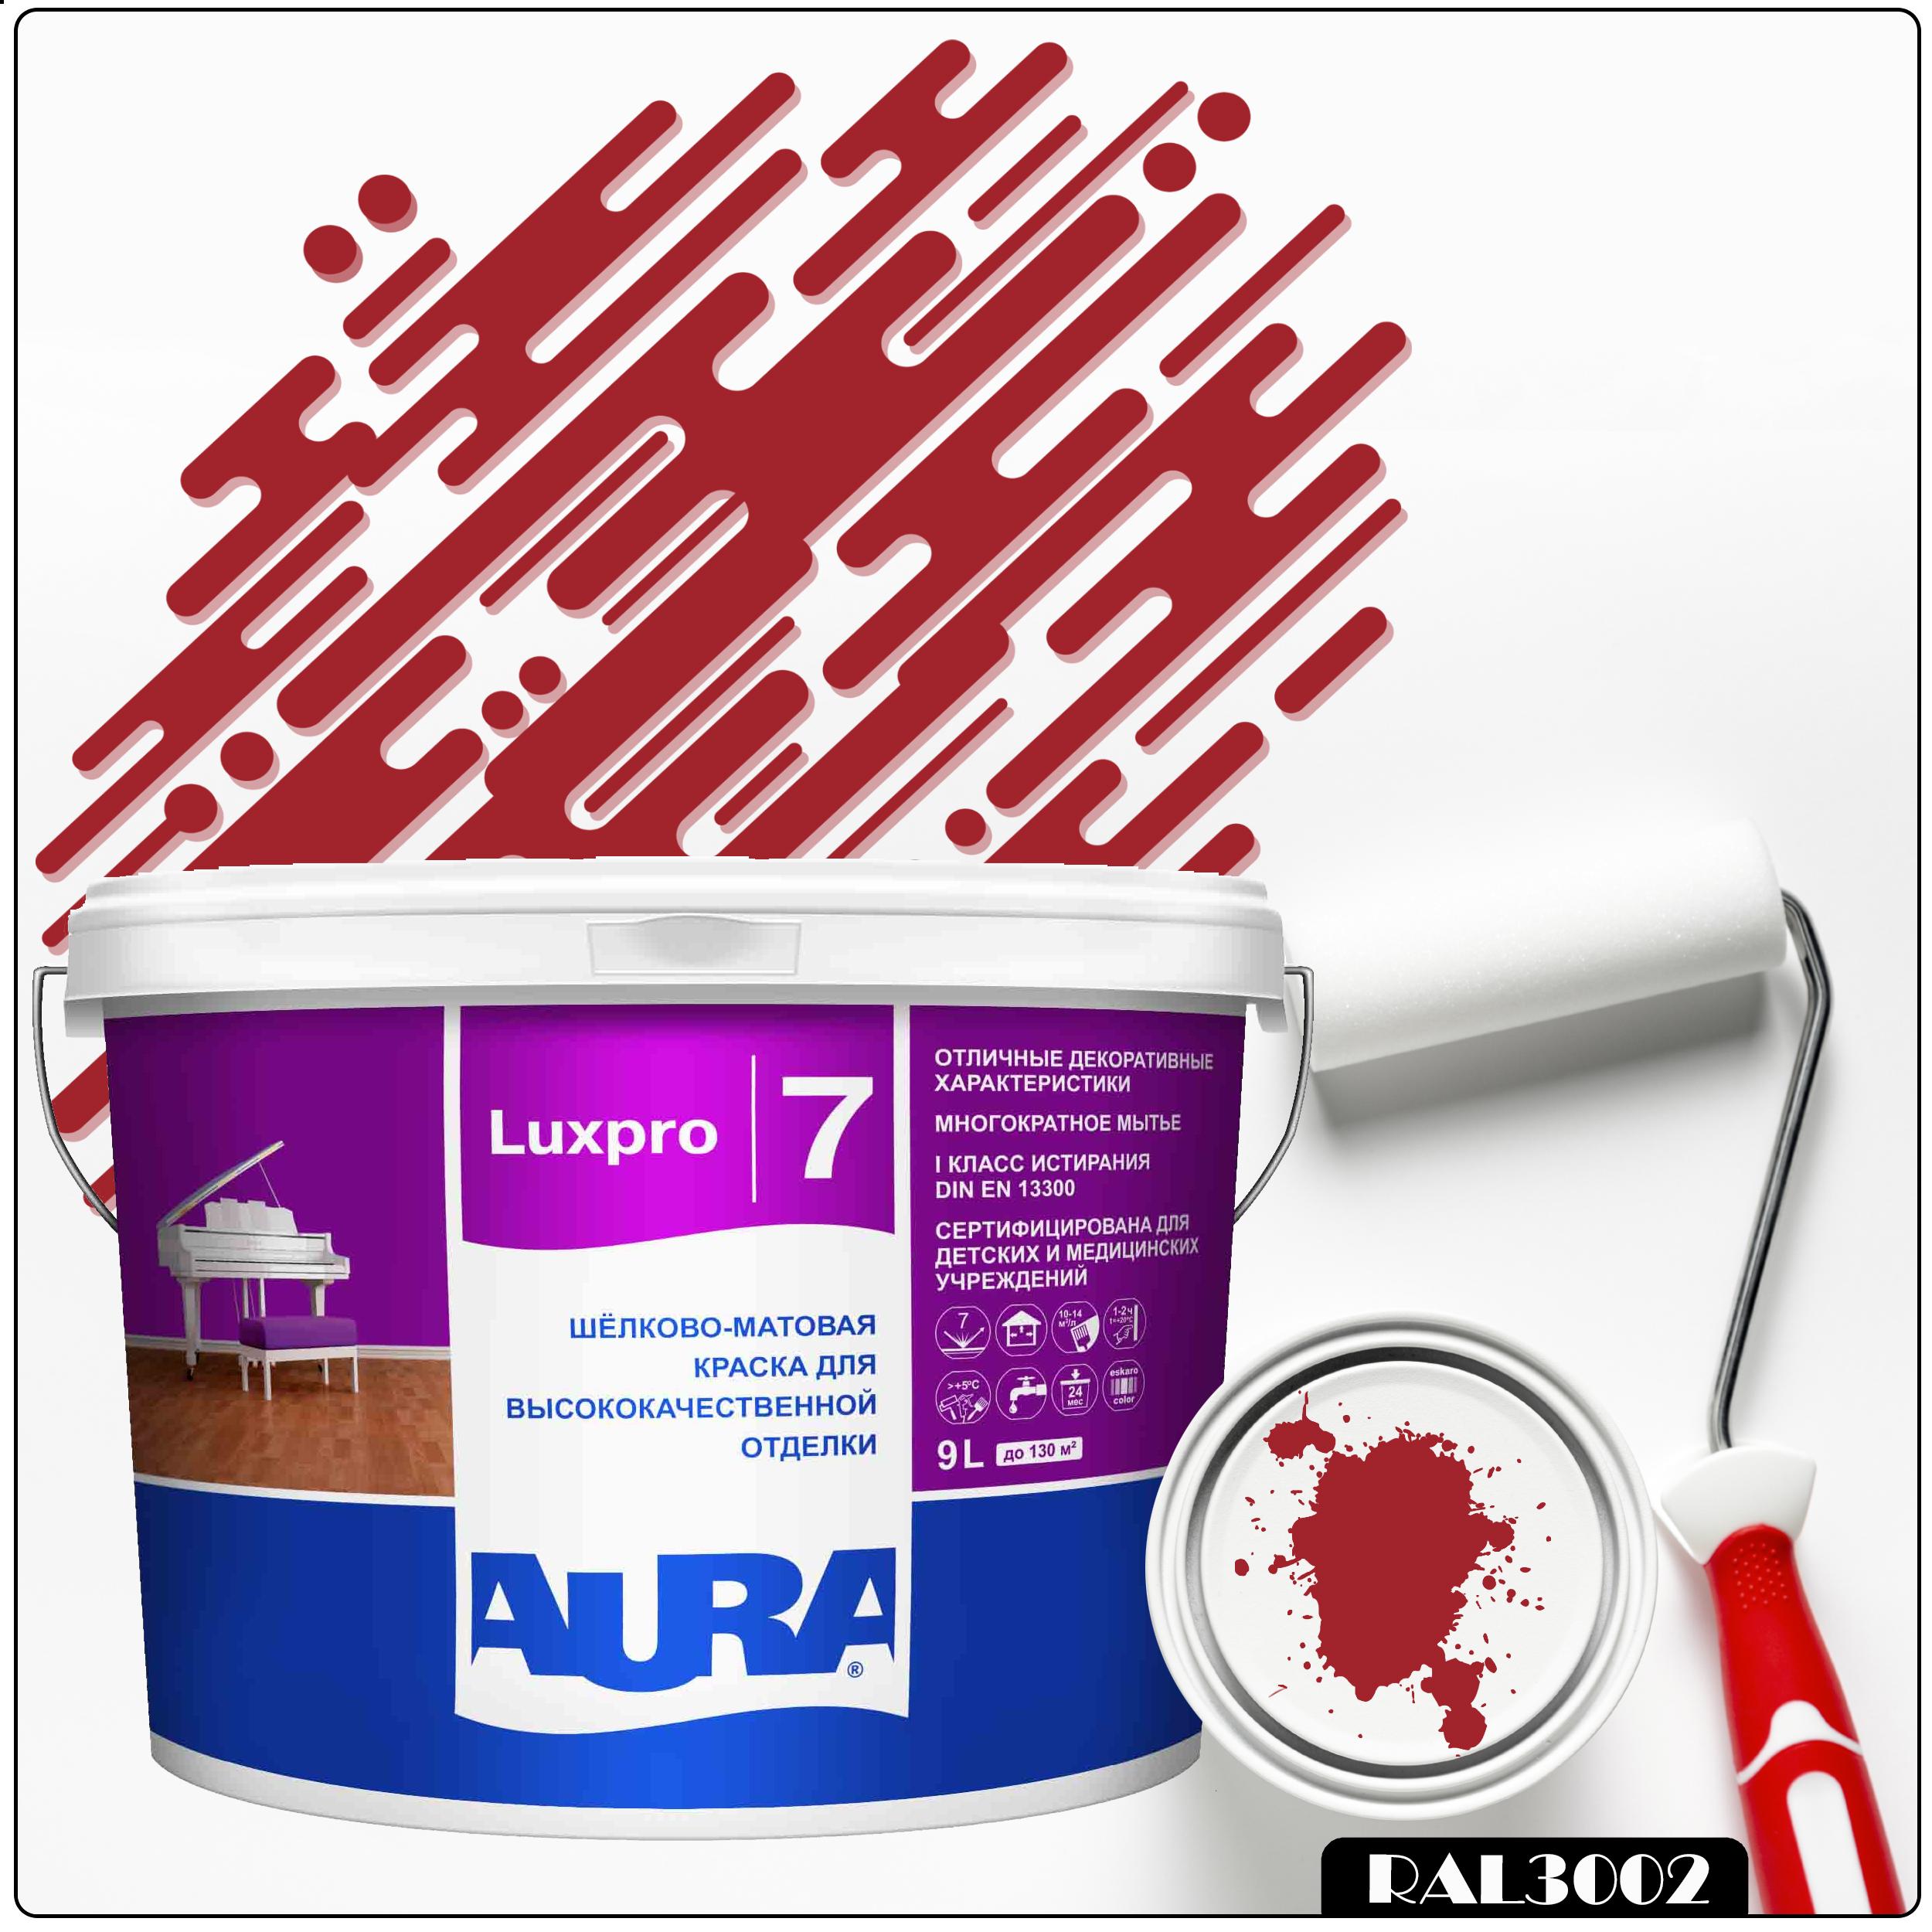 Фото 3 - Краска Aura LuxPRO 7, RAL 3002 Карминно-красный, латексная, шелково-матовая, интерьерная, 9л, Аура.